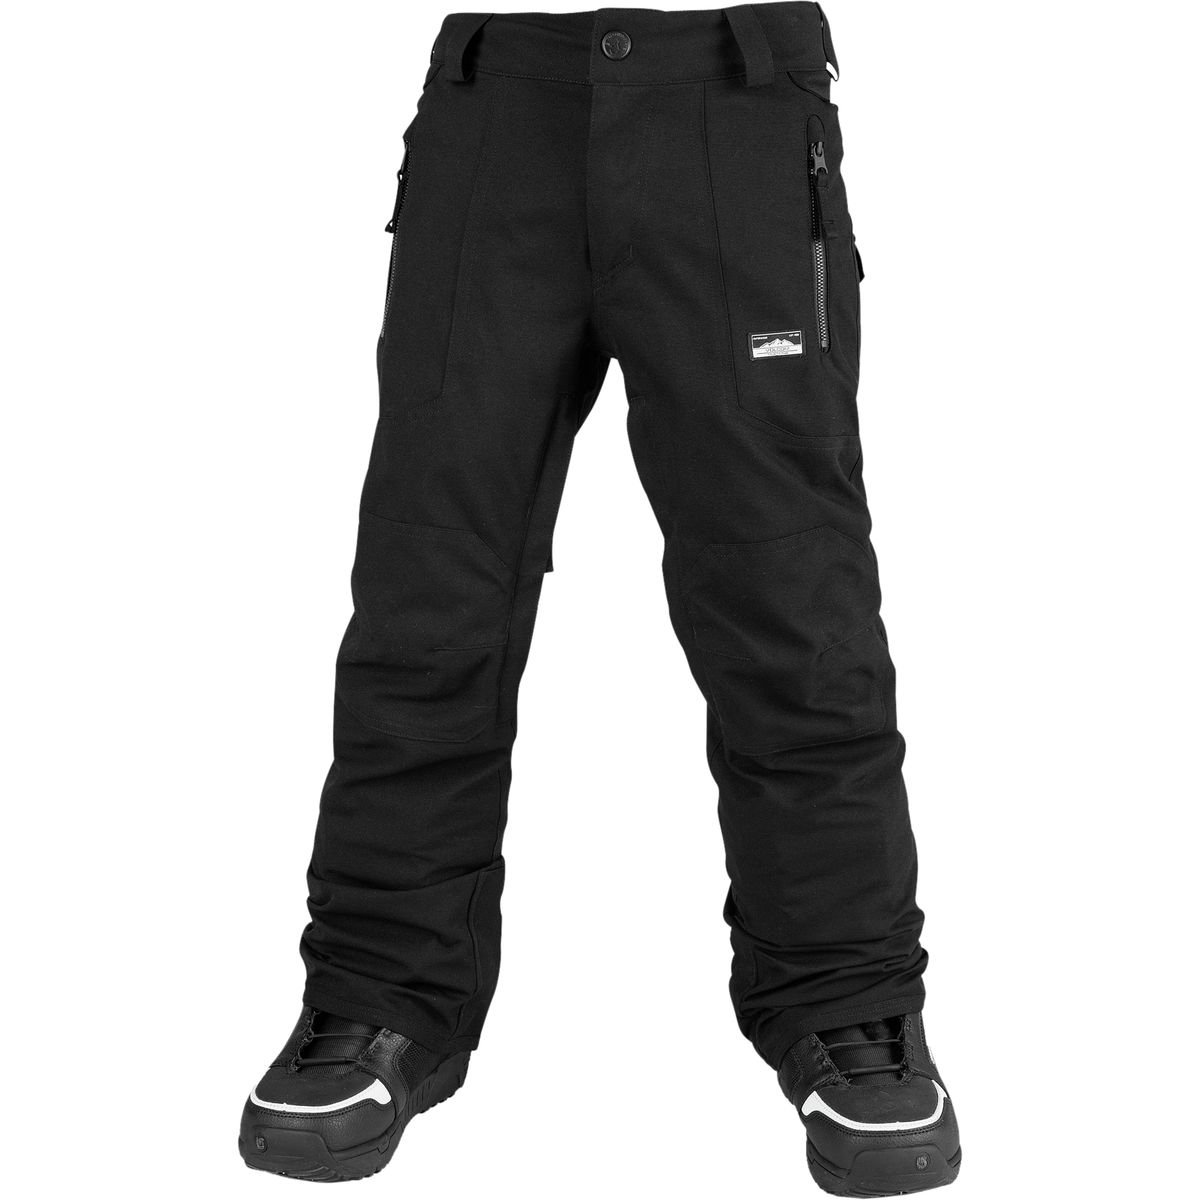 Volcom Big Boys' Datura Pant, Black, L by Volcom